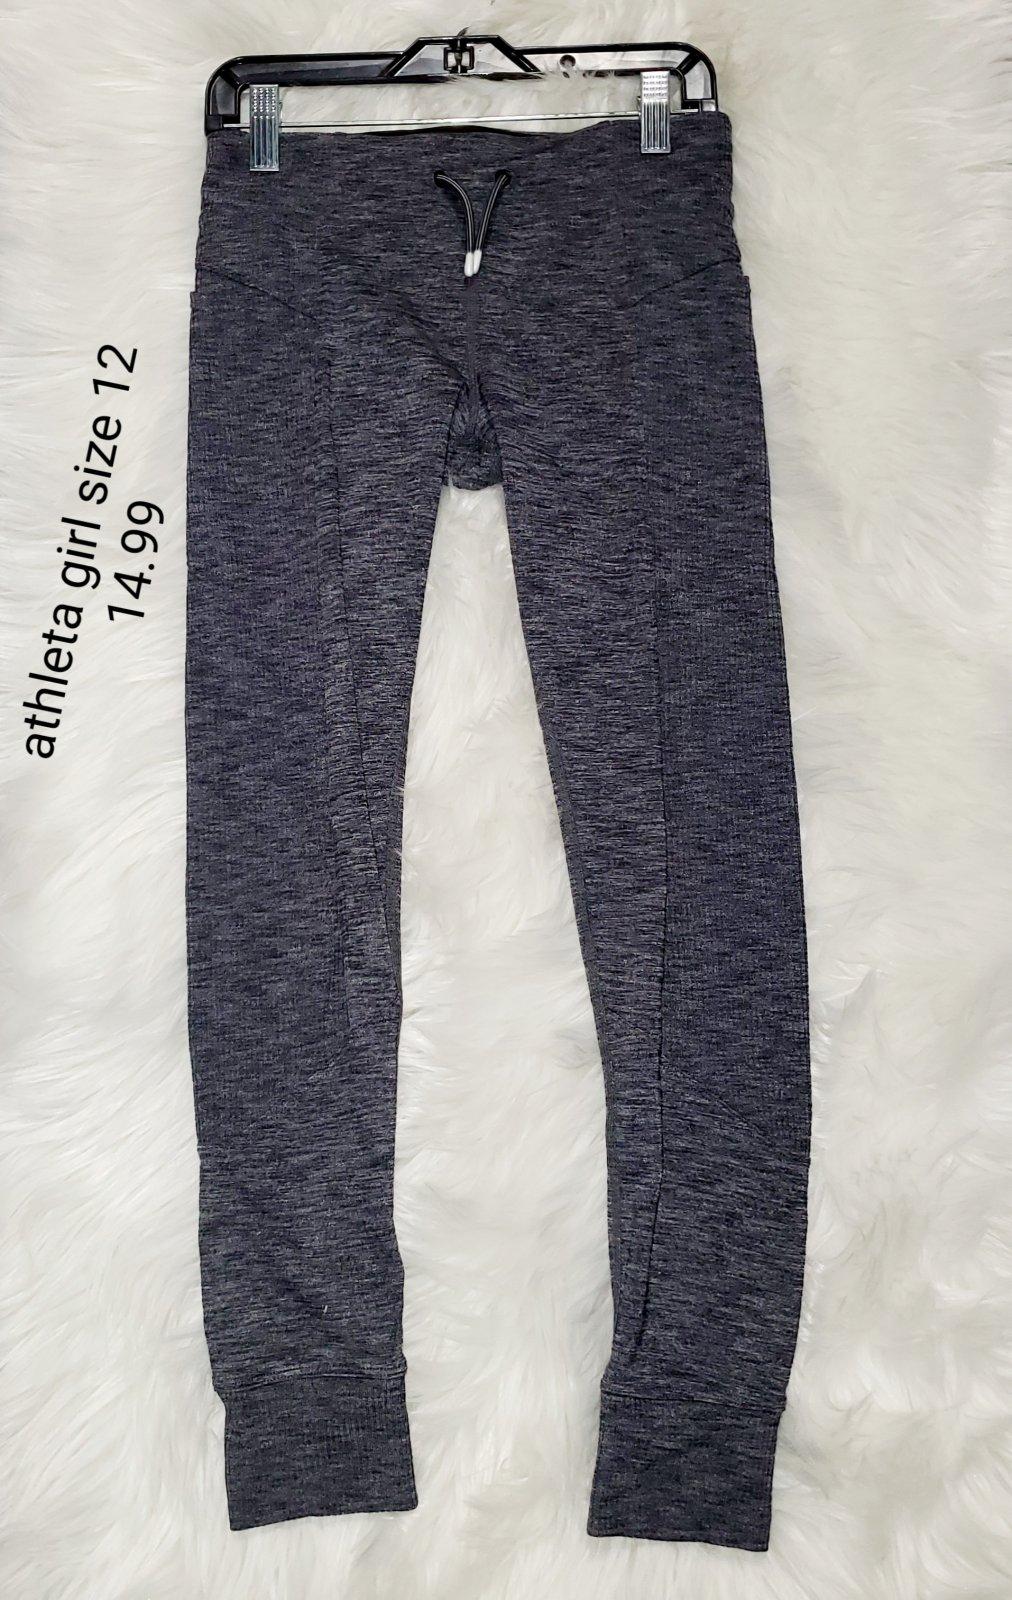 Athleta girl athletic pants grey girls size 12